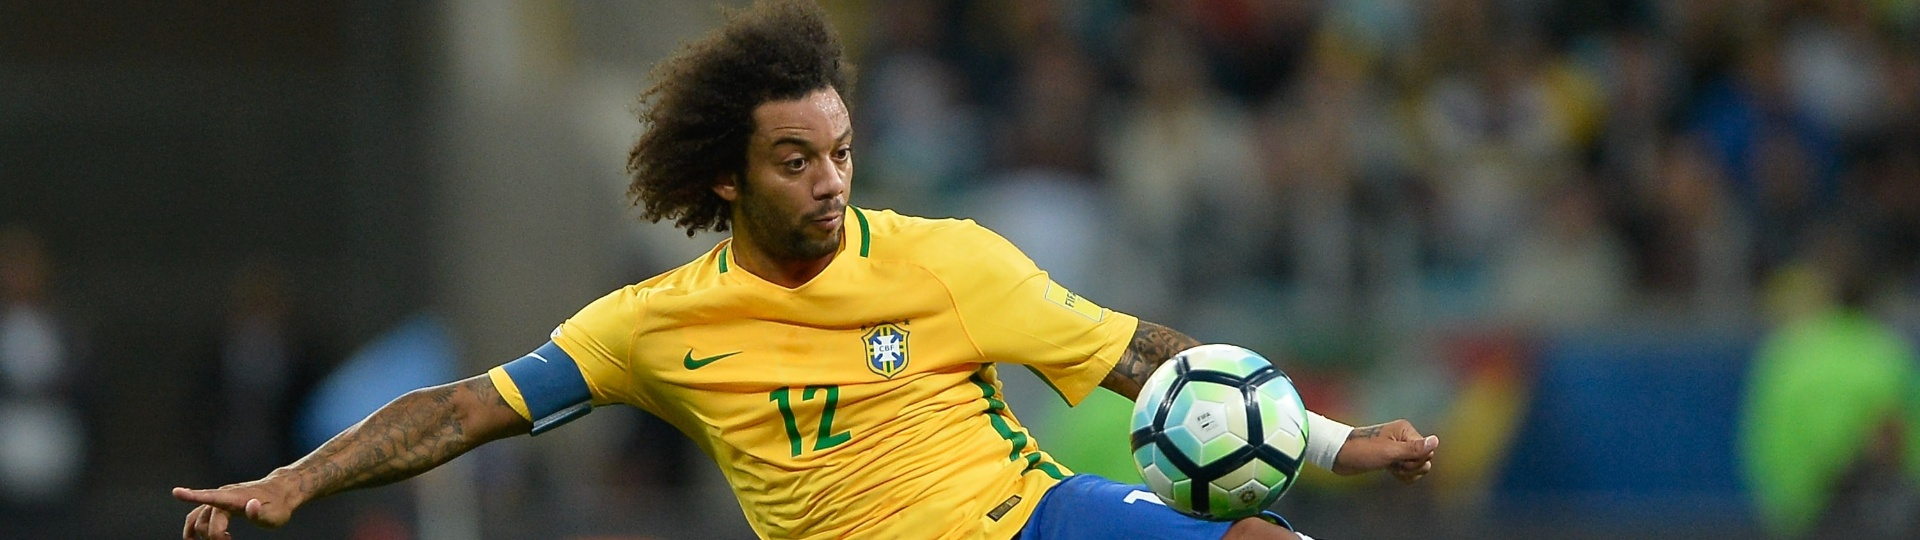 Marcelo arrisca virada de bola durante o jogo contra o Uruguai